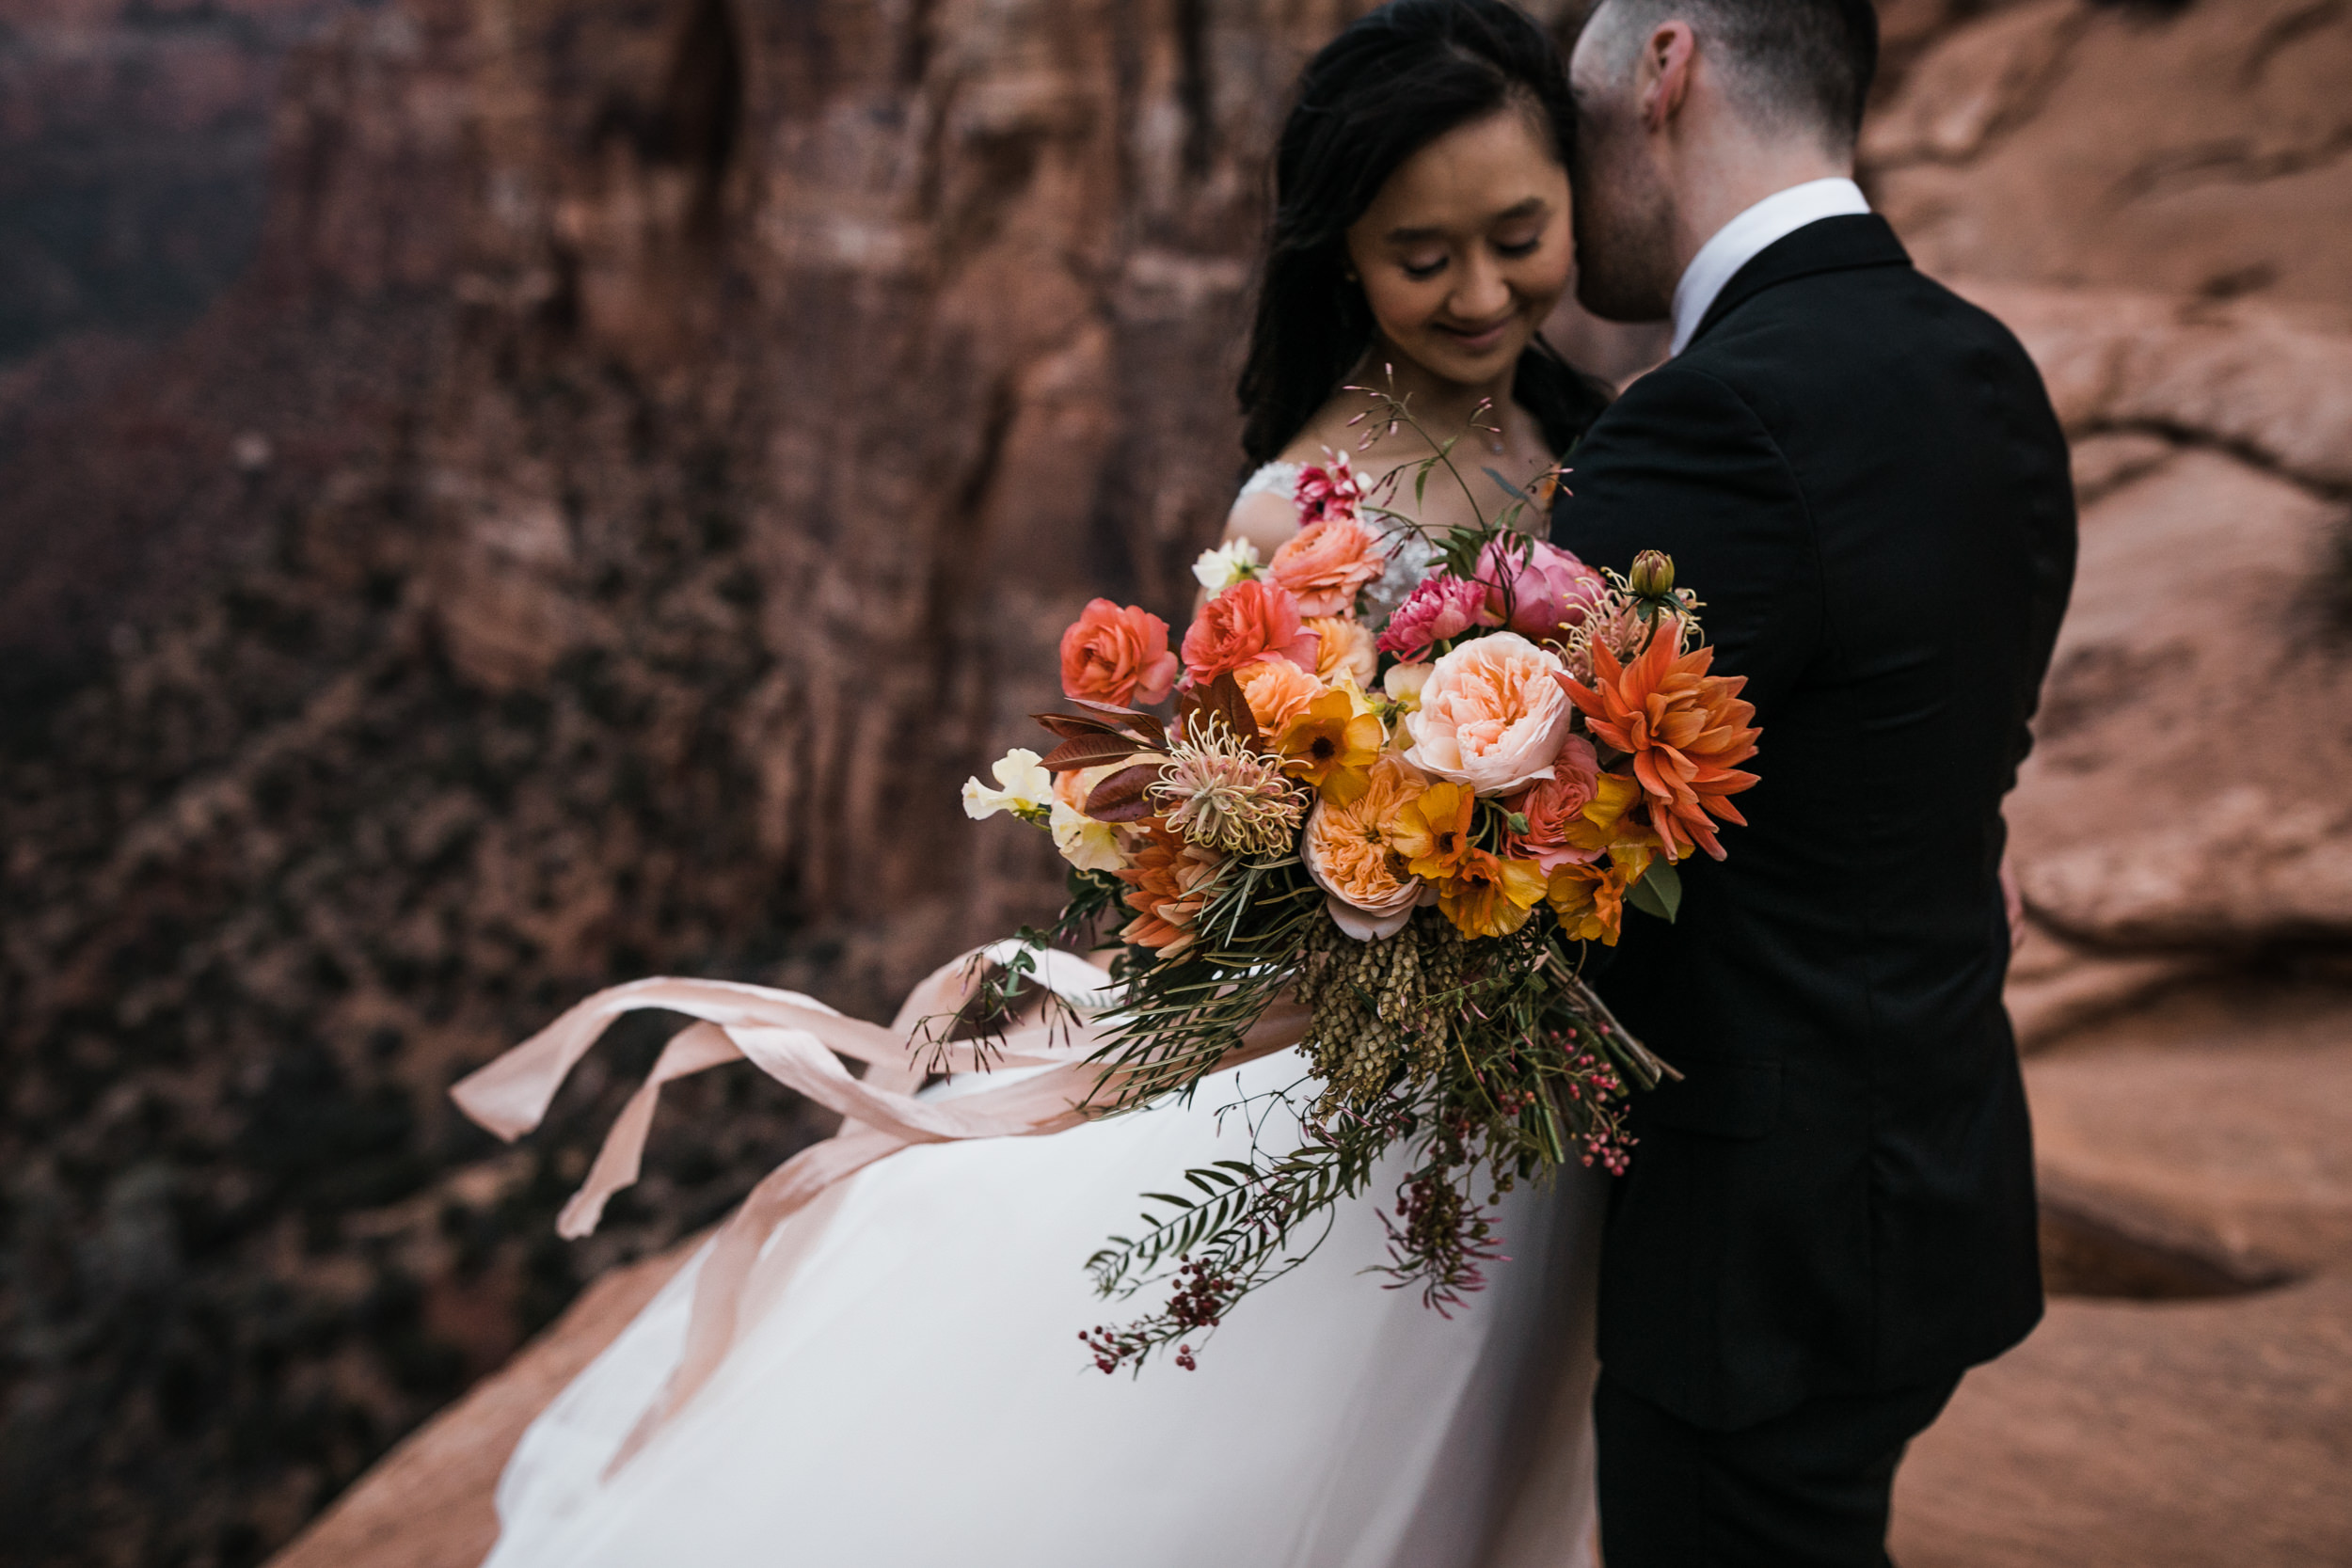 Zion-National-Park-Sunrise-Elopement-Hearnes-Wedding-Photography-14.jpg